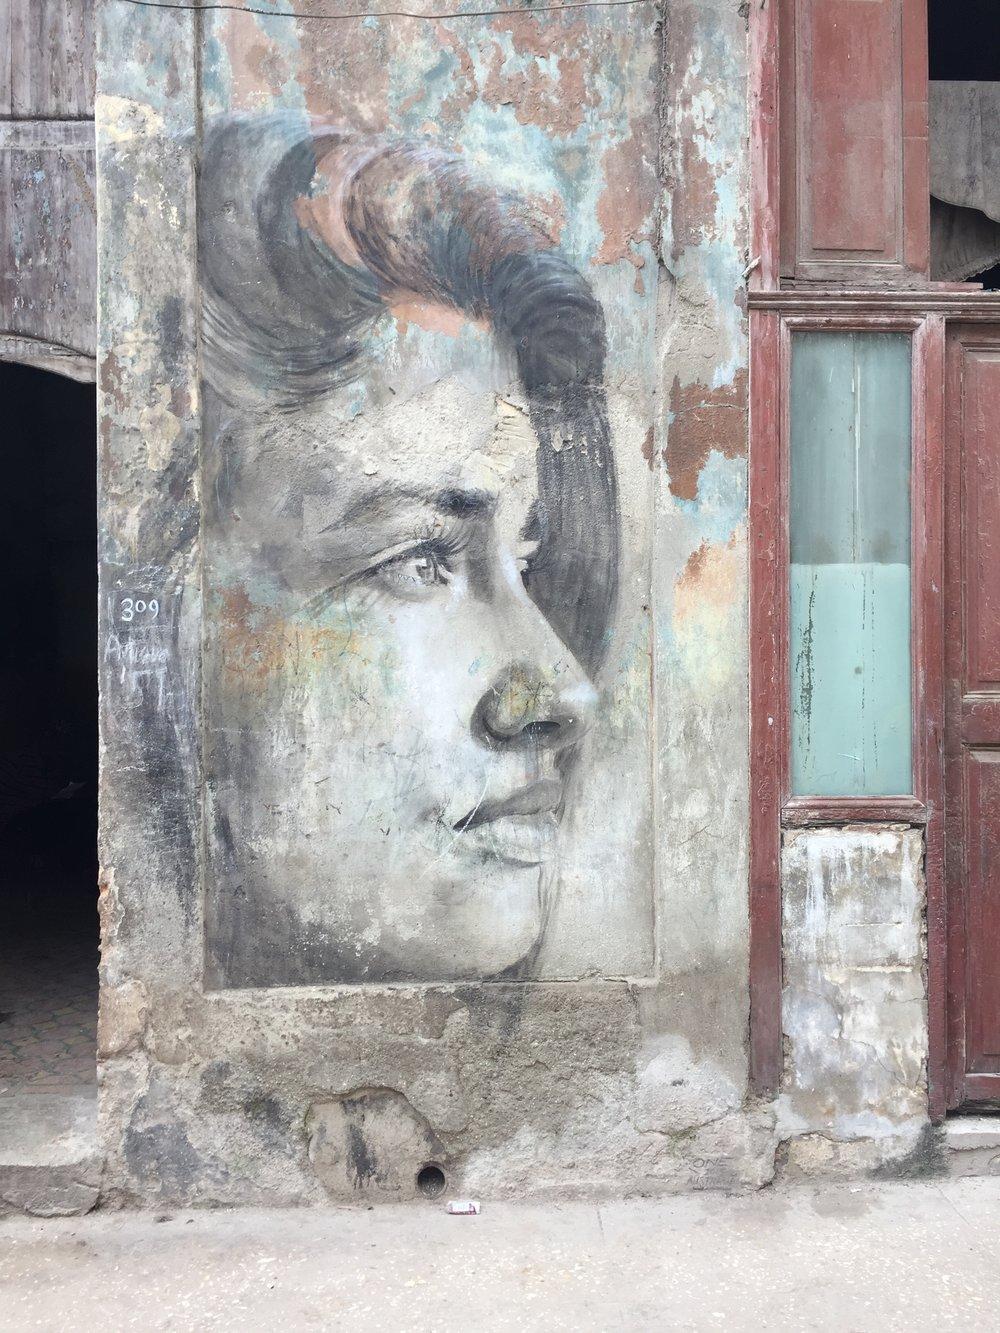 Street art photo by Jenny Rushmore